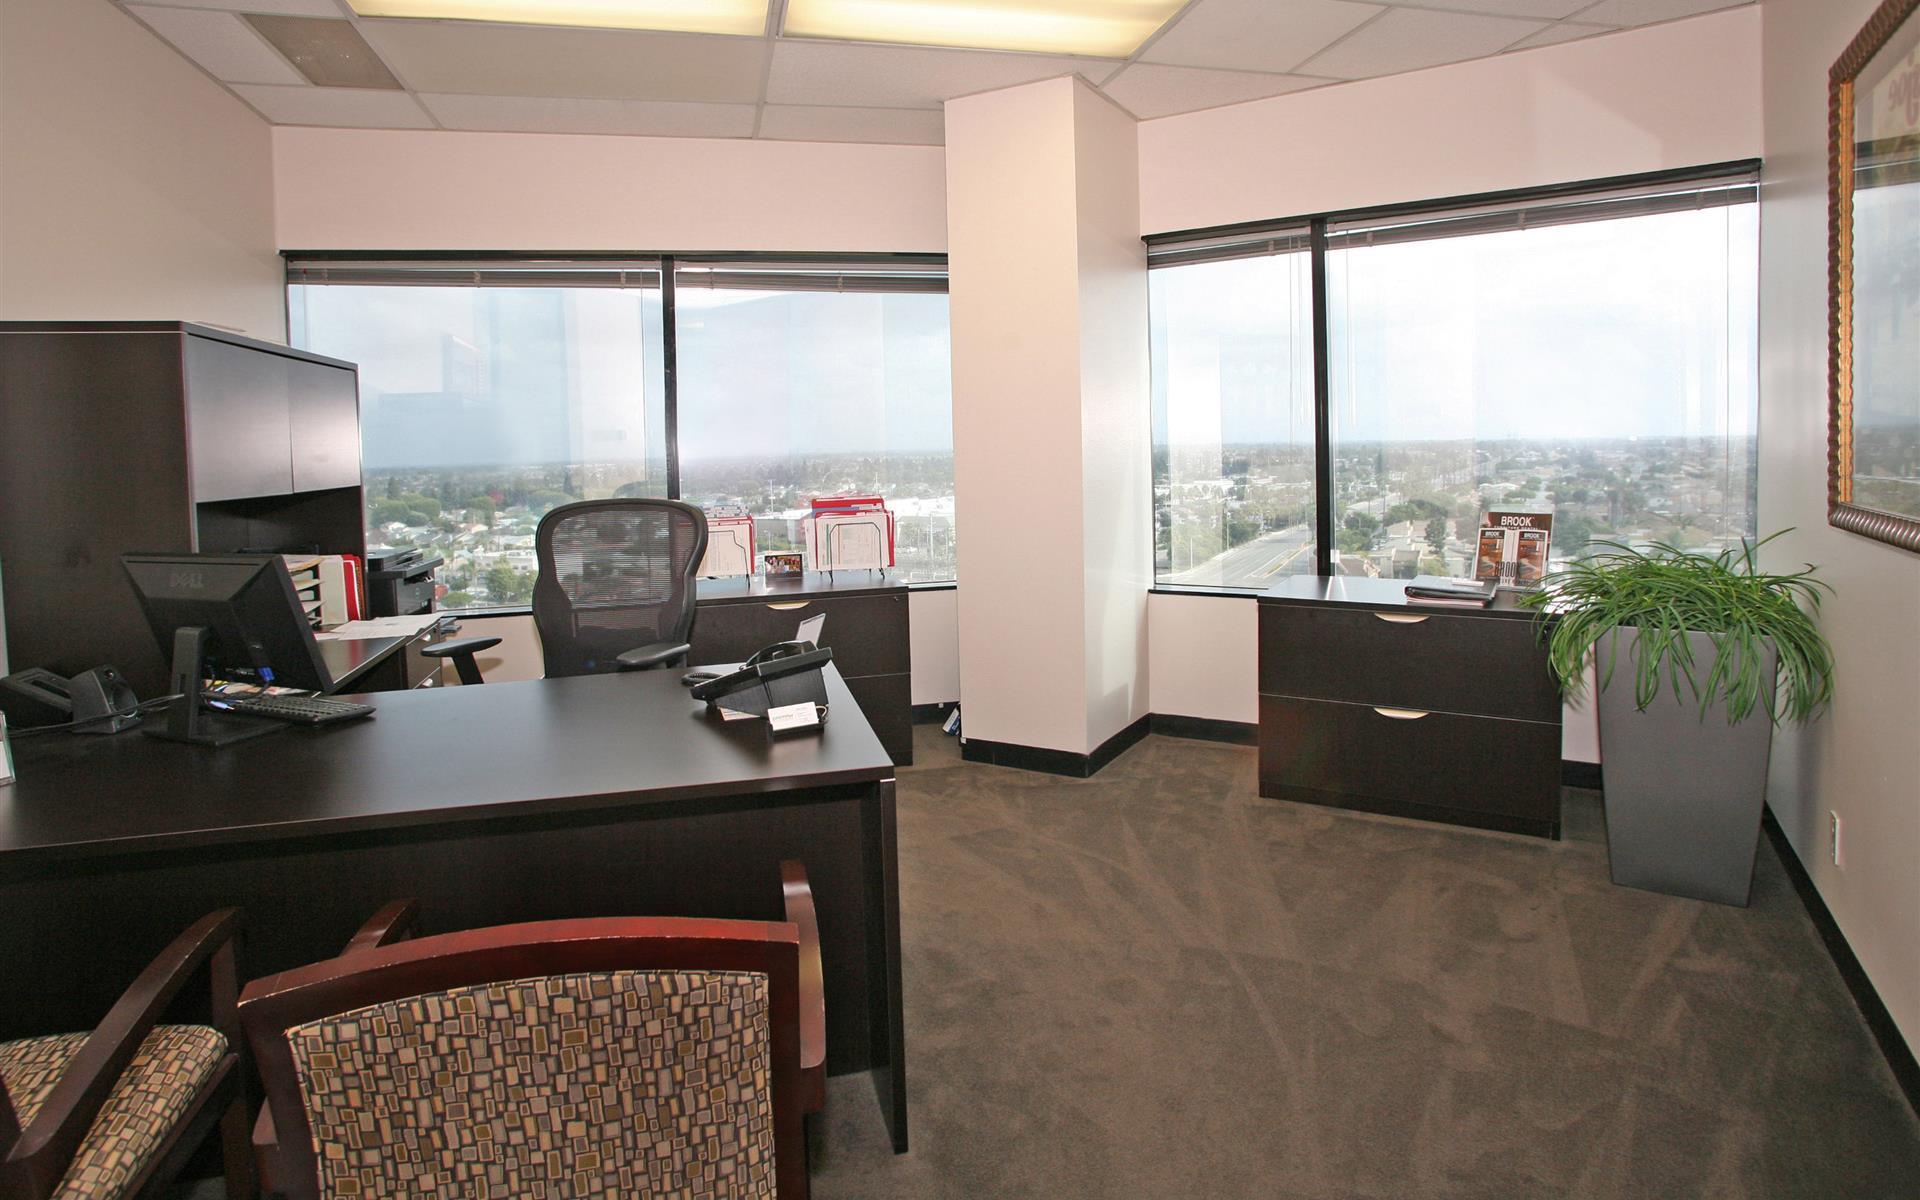 (HBP) Huntington Beach Plaza - Exterior Office